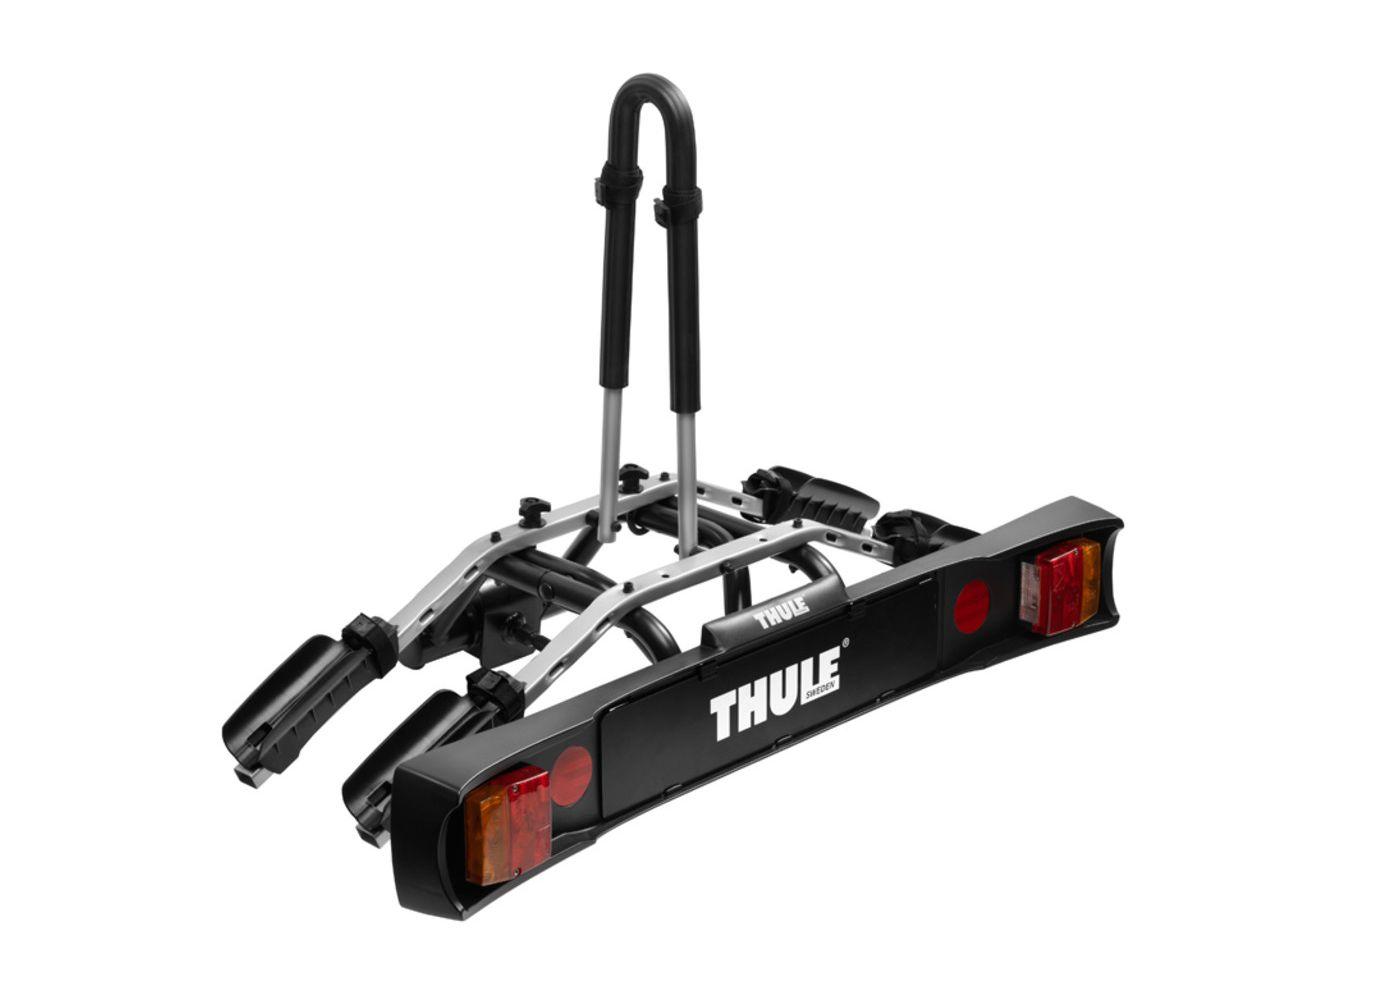 Transbike THULE Rideon 9502 para engate de reboque 2 Bikes